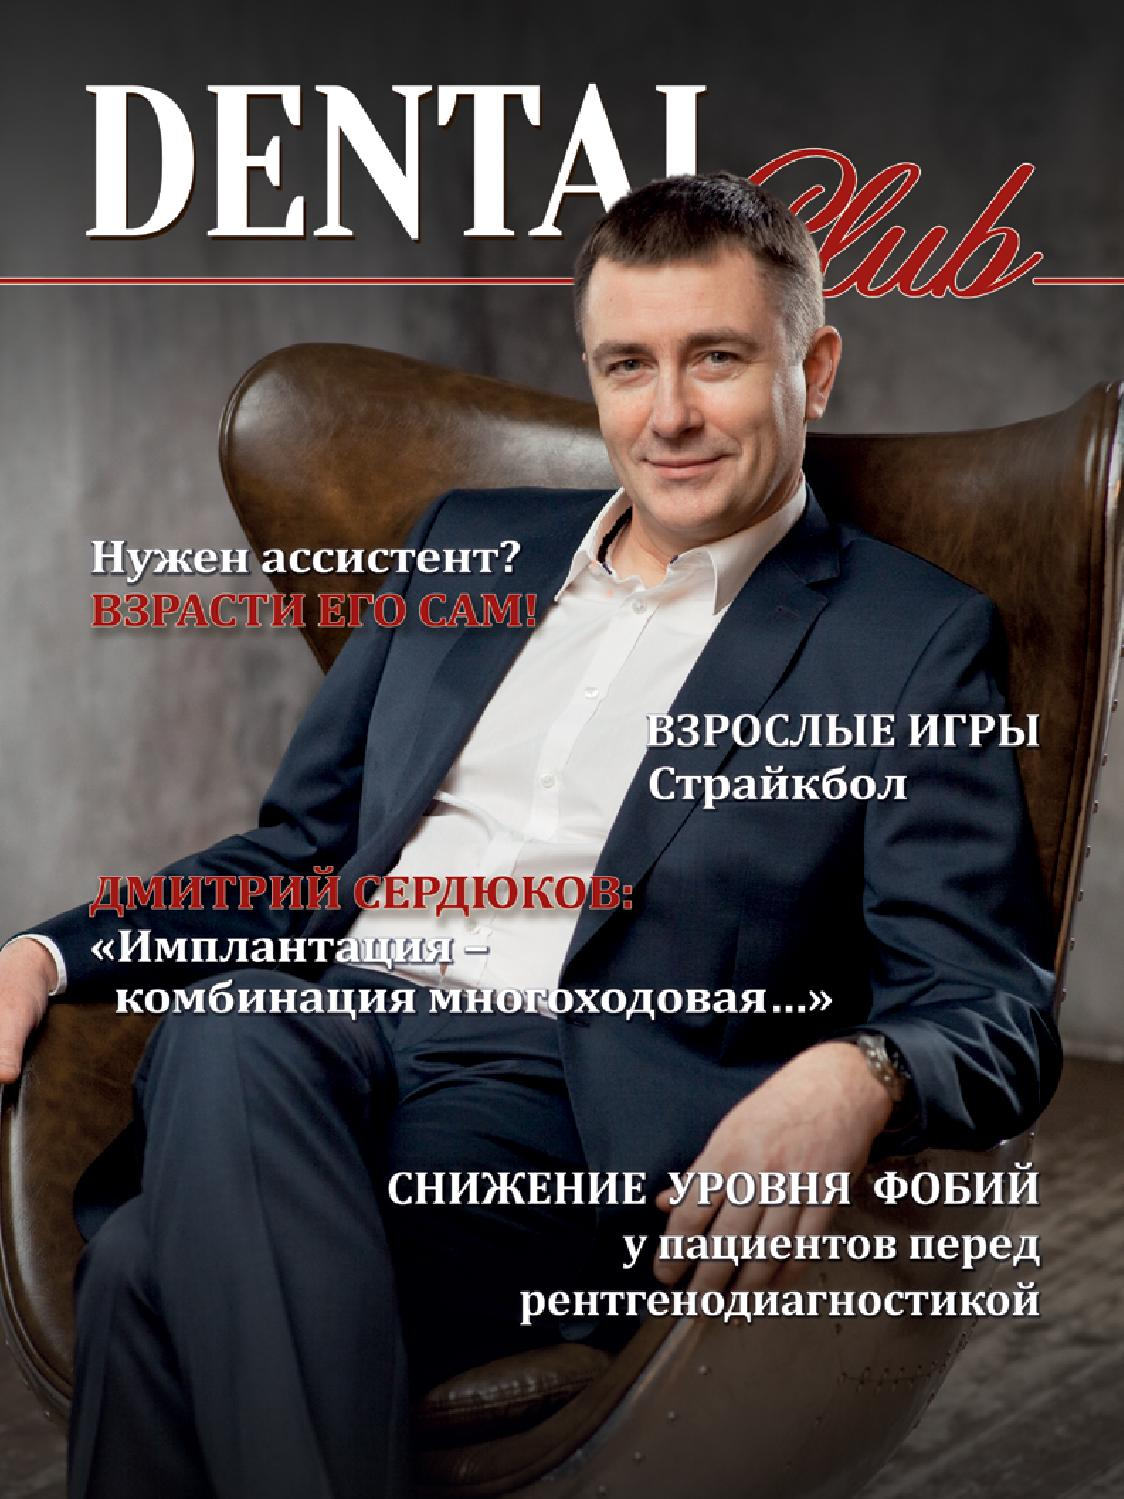 медицинский stomatologicheskie журнал